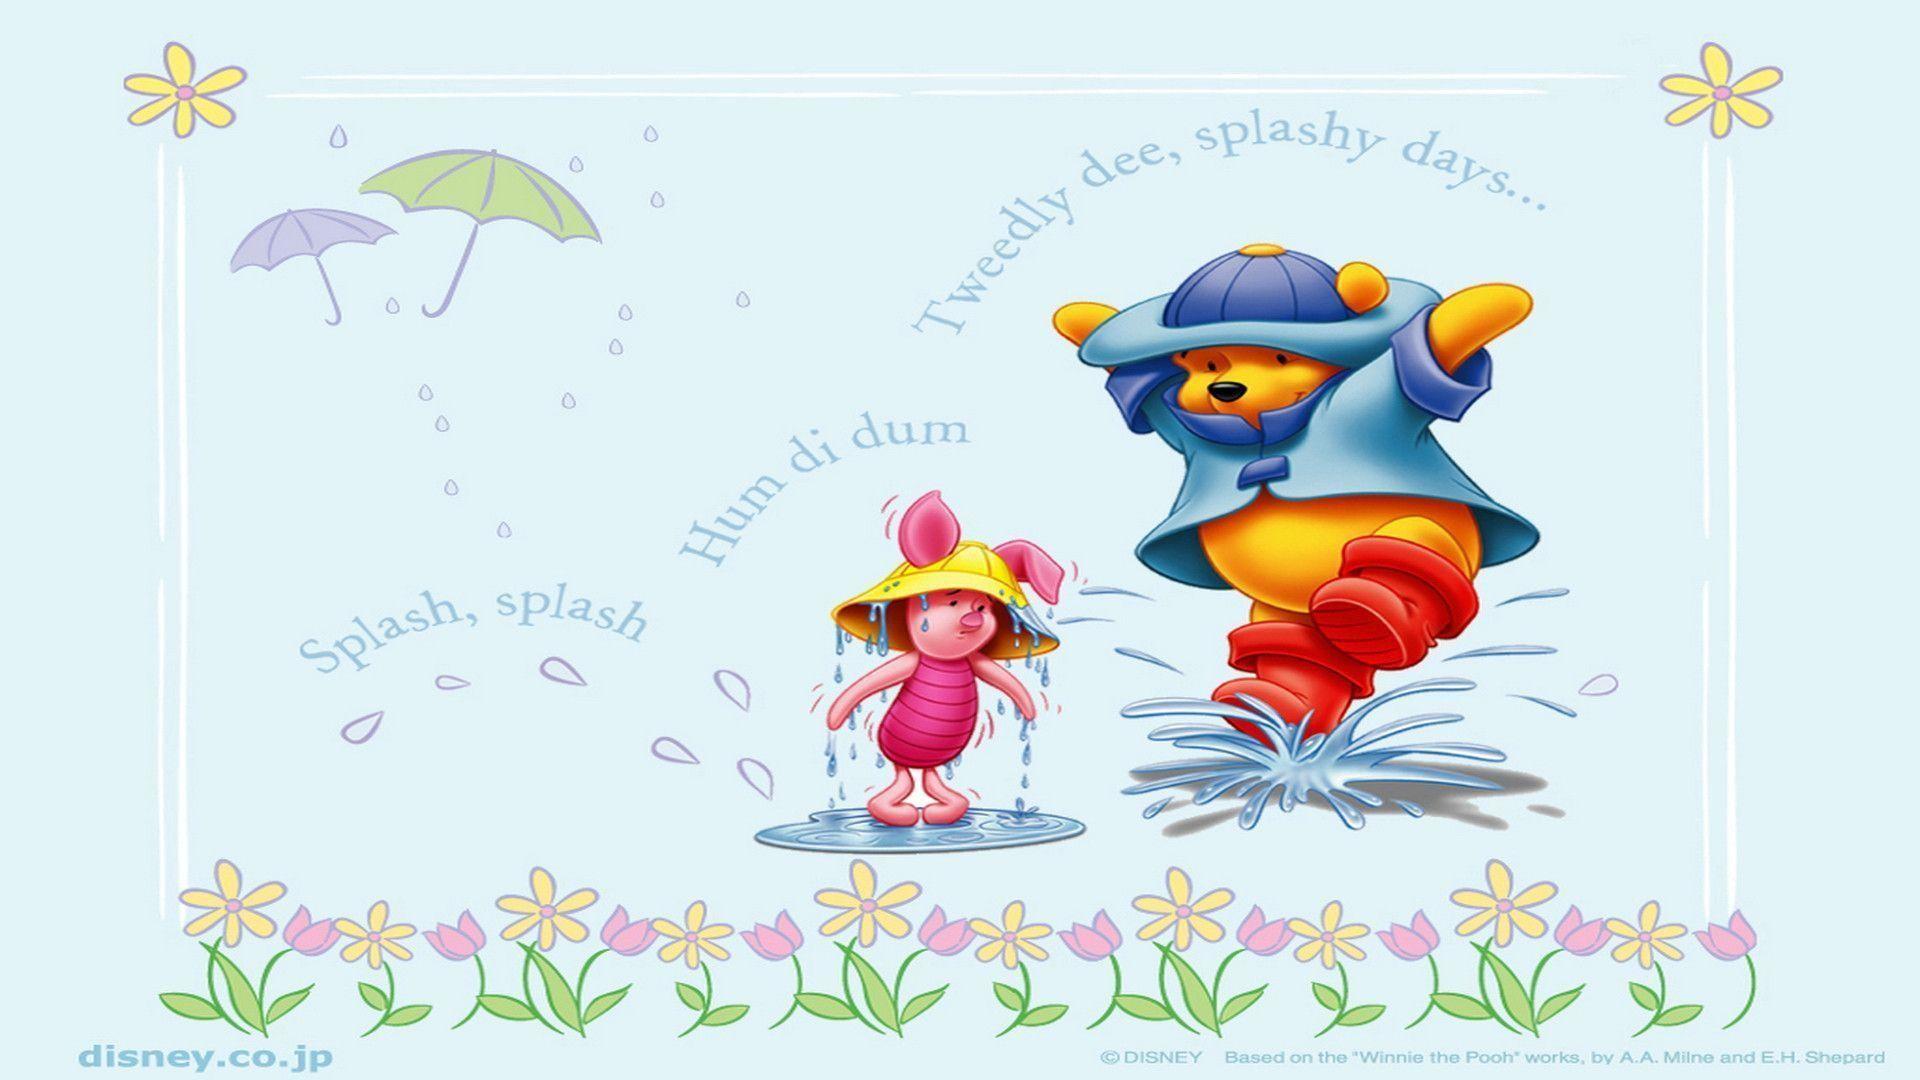 Cute Patrick Star Wallpaper Baby Disney Characters Wallpaper 59 Images